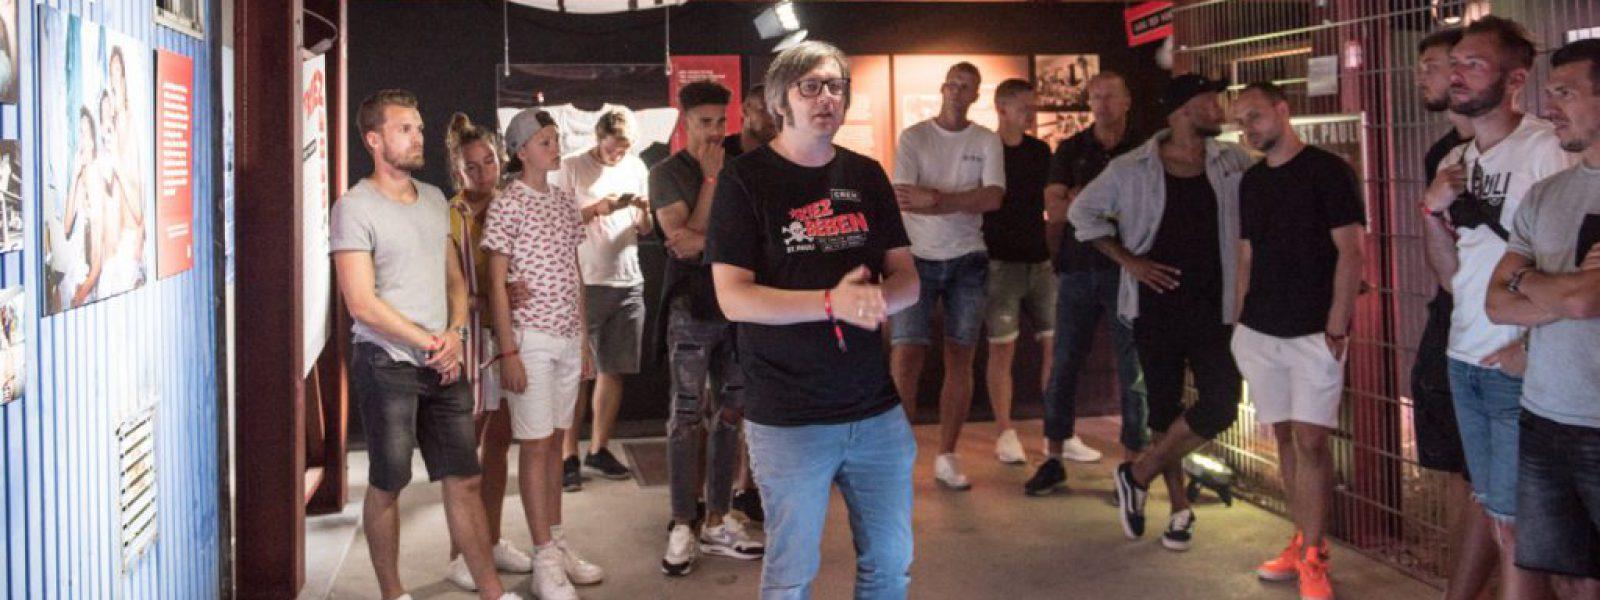 2019_0623 FC St Pauli erste Mannschaft im KIEZBEBEN (Foto Sabrina Adeline Nagel) - 15